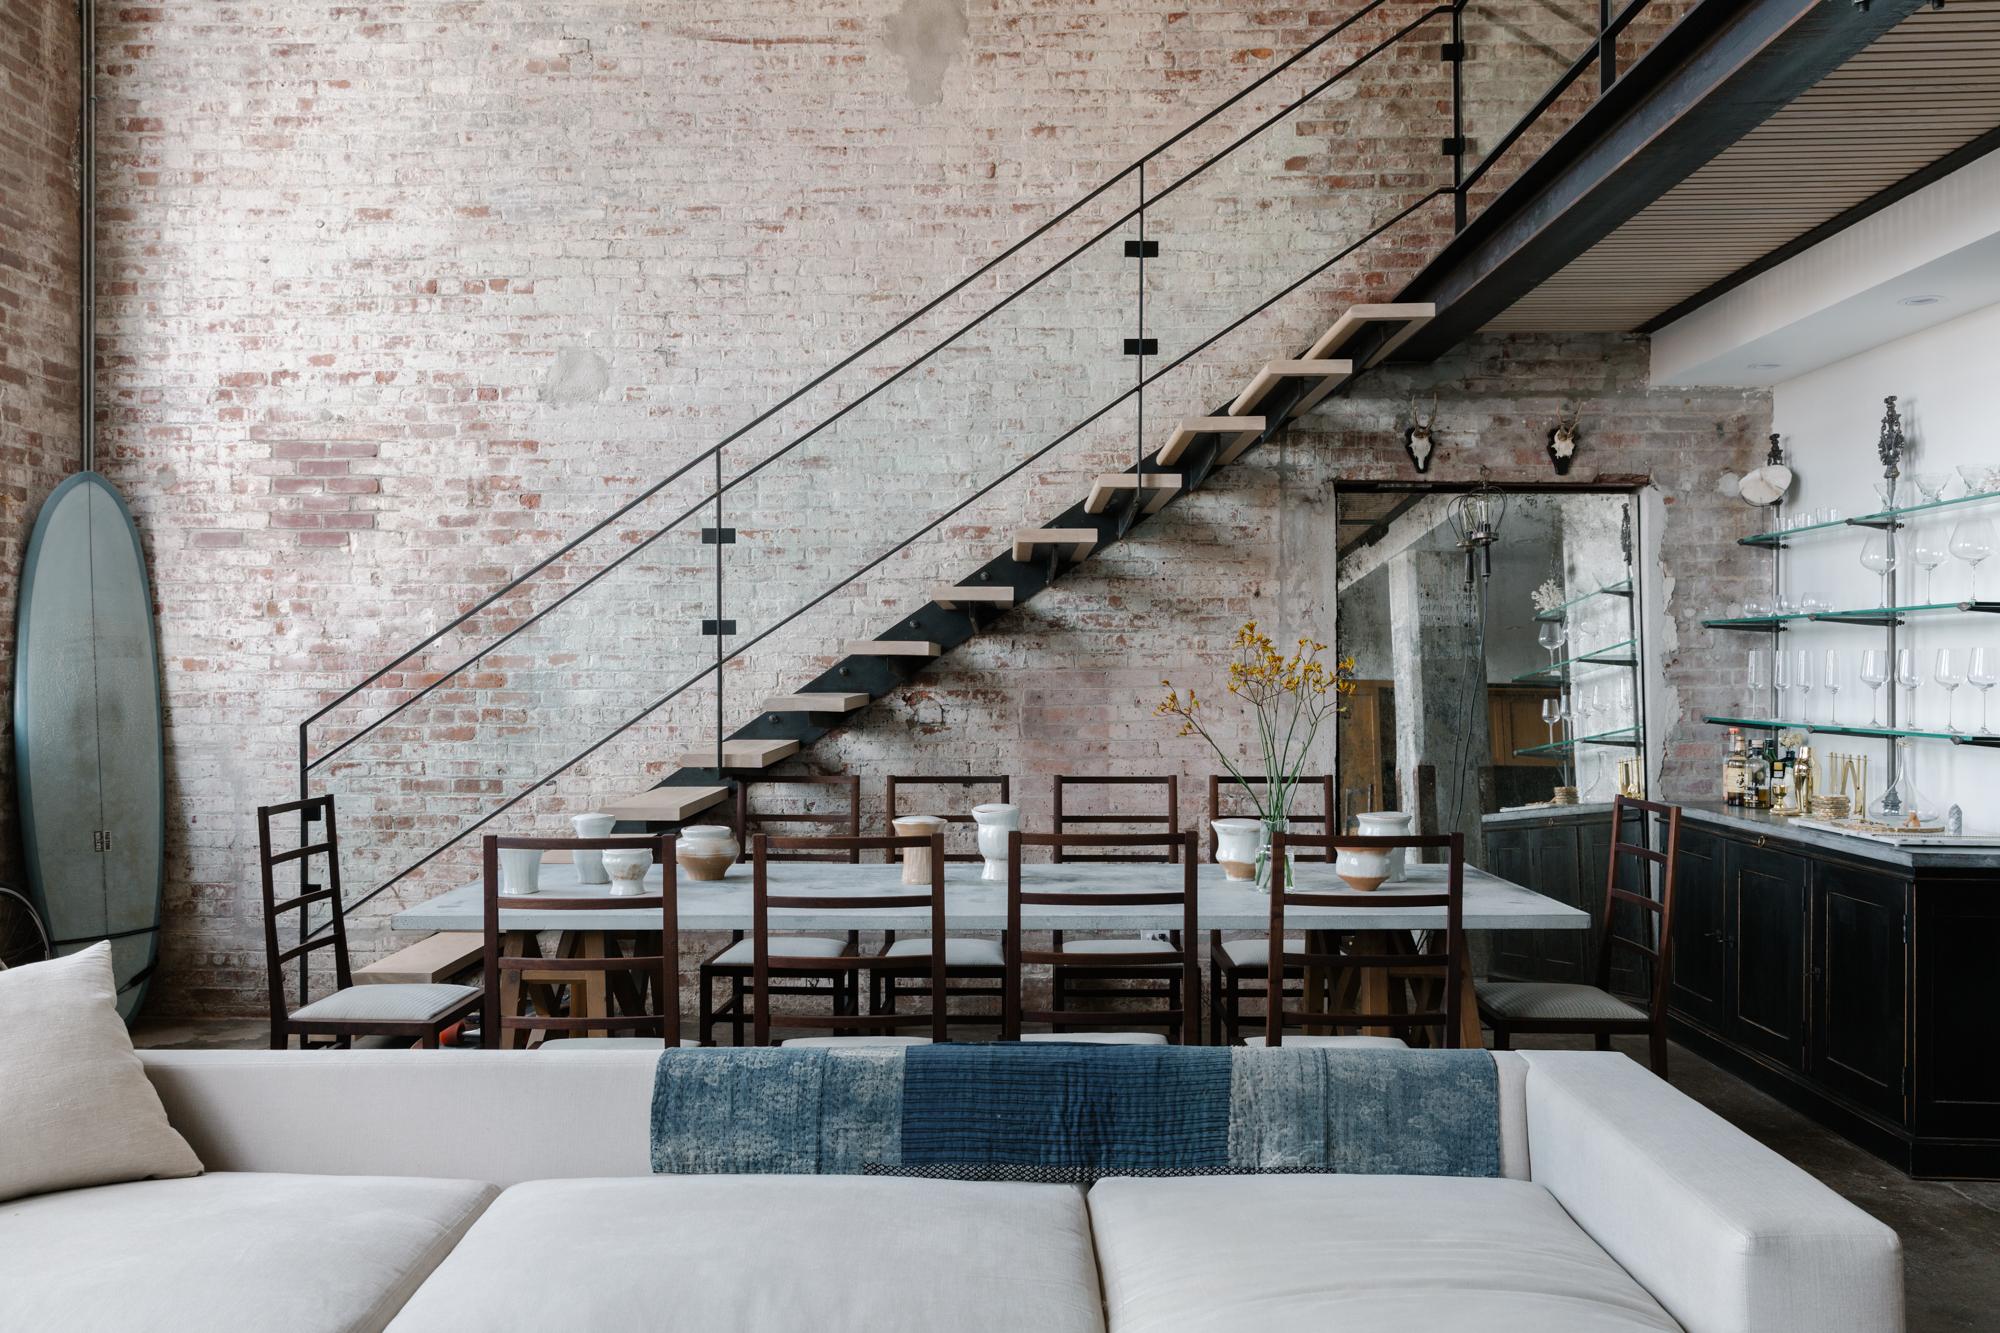 Jae Joo Brooklyn loft living and dining room